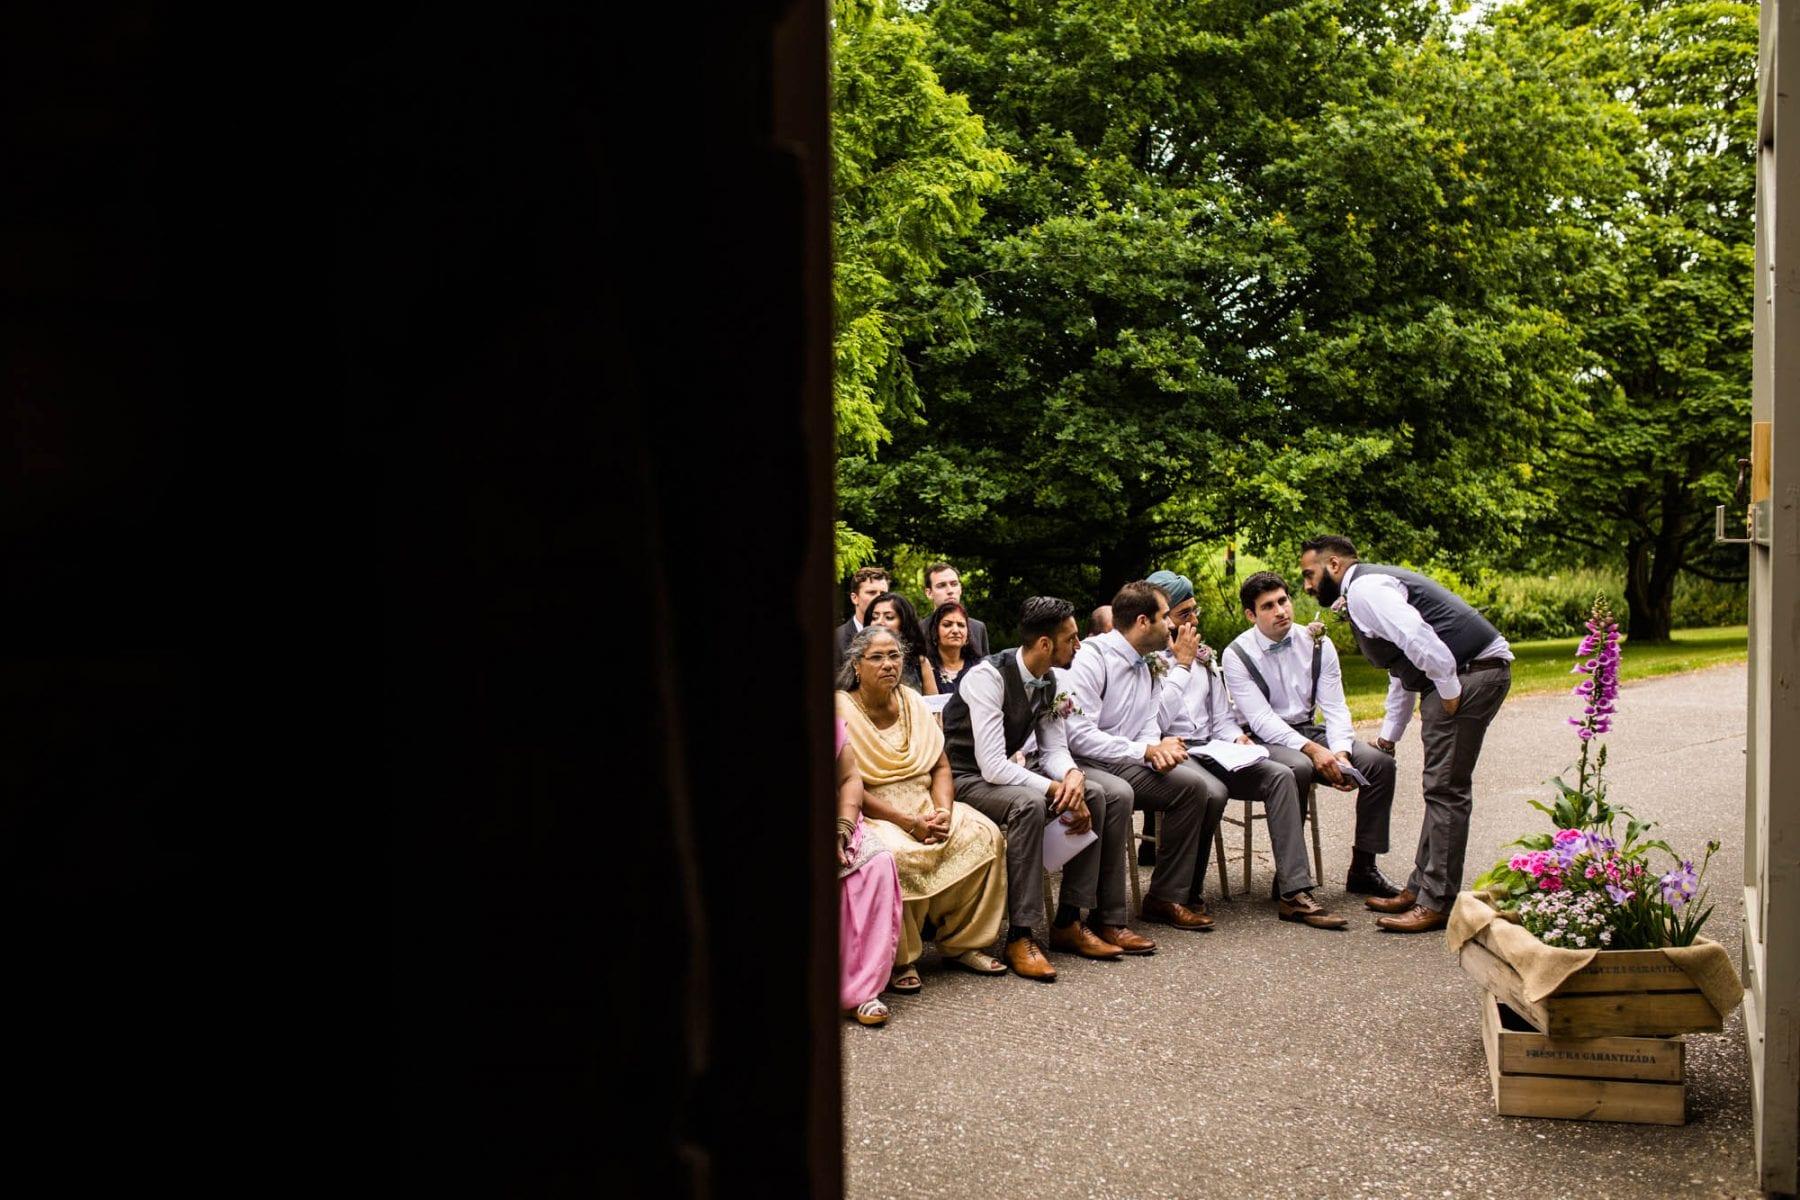 Pimhill Barn Outdoor Wedding Ceremony